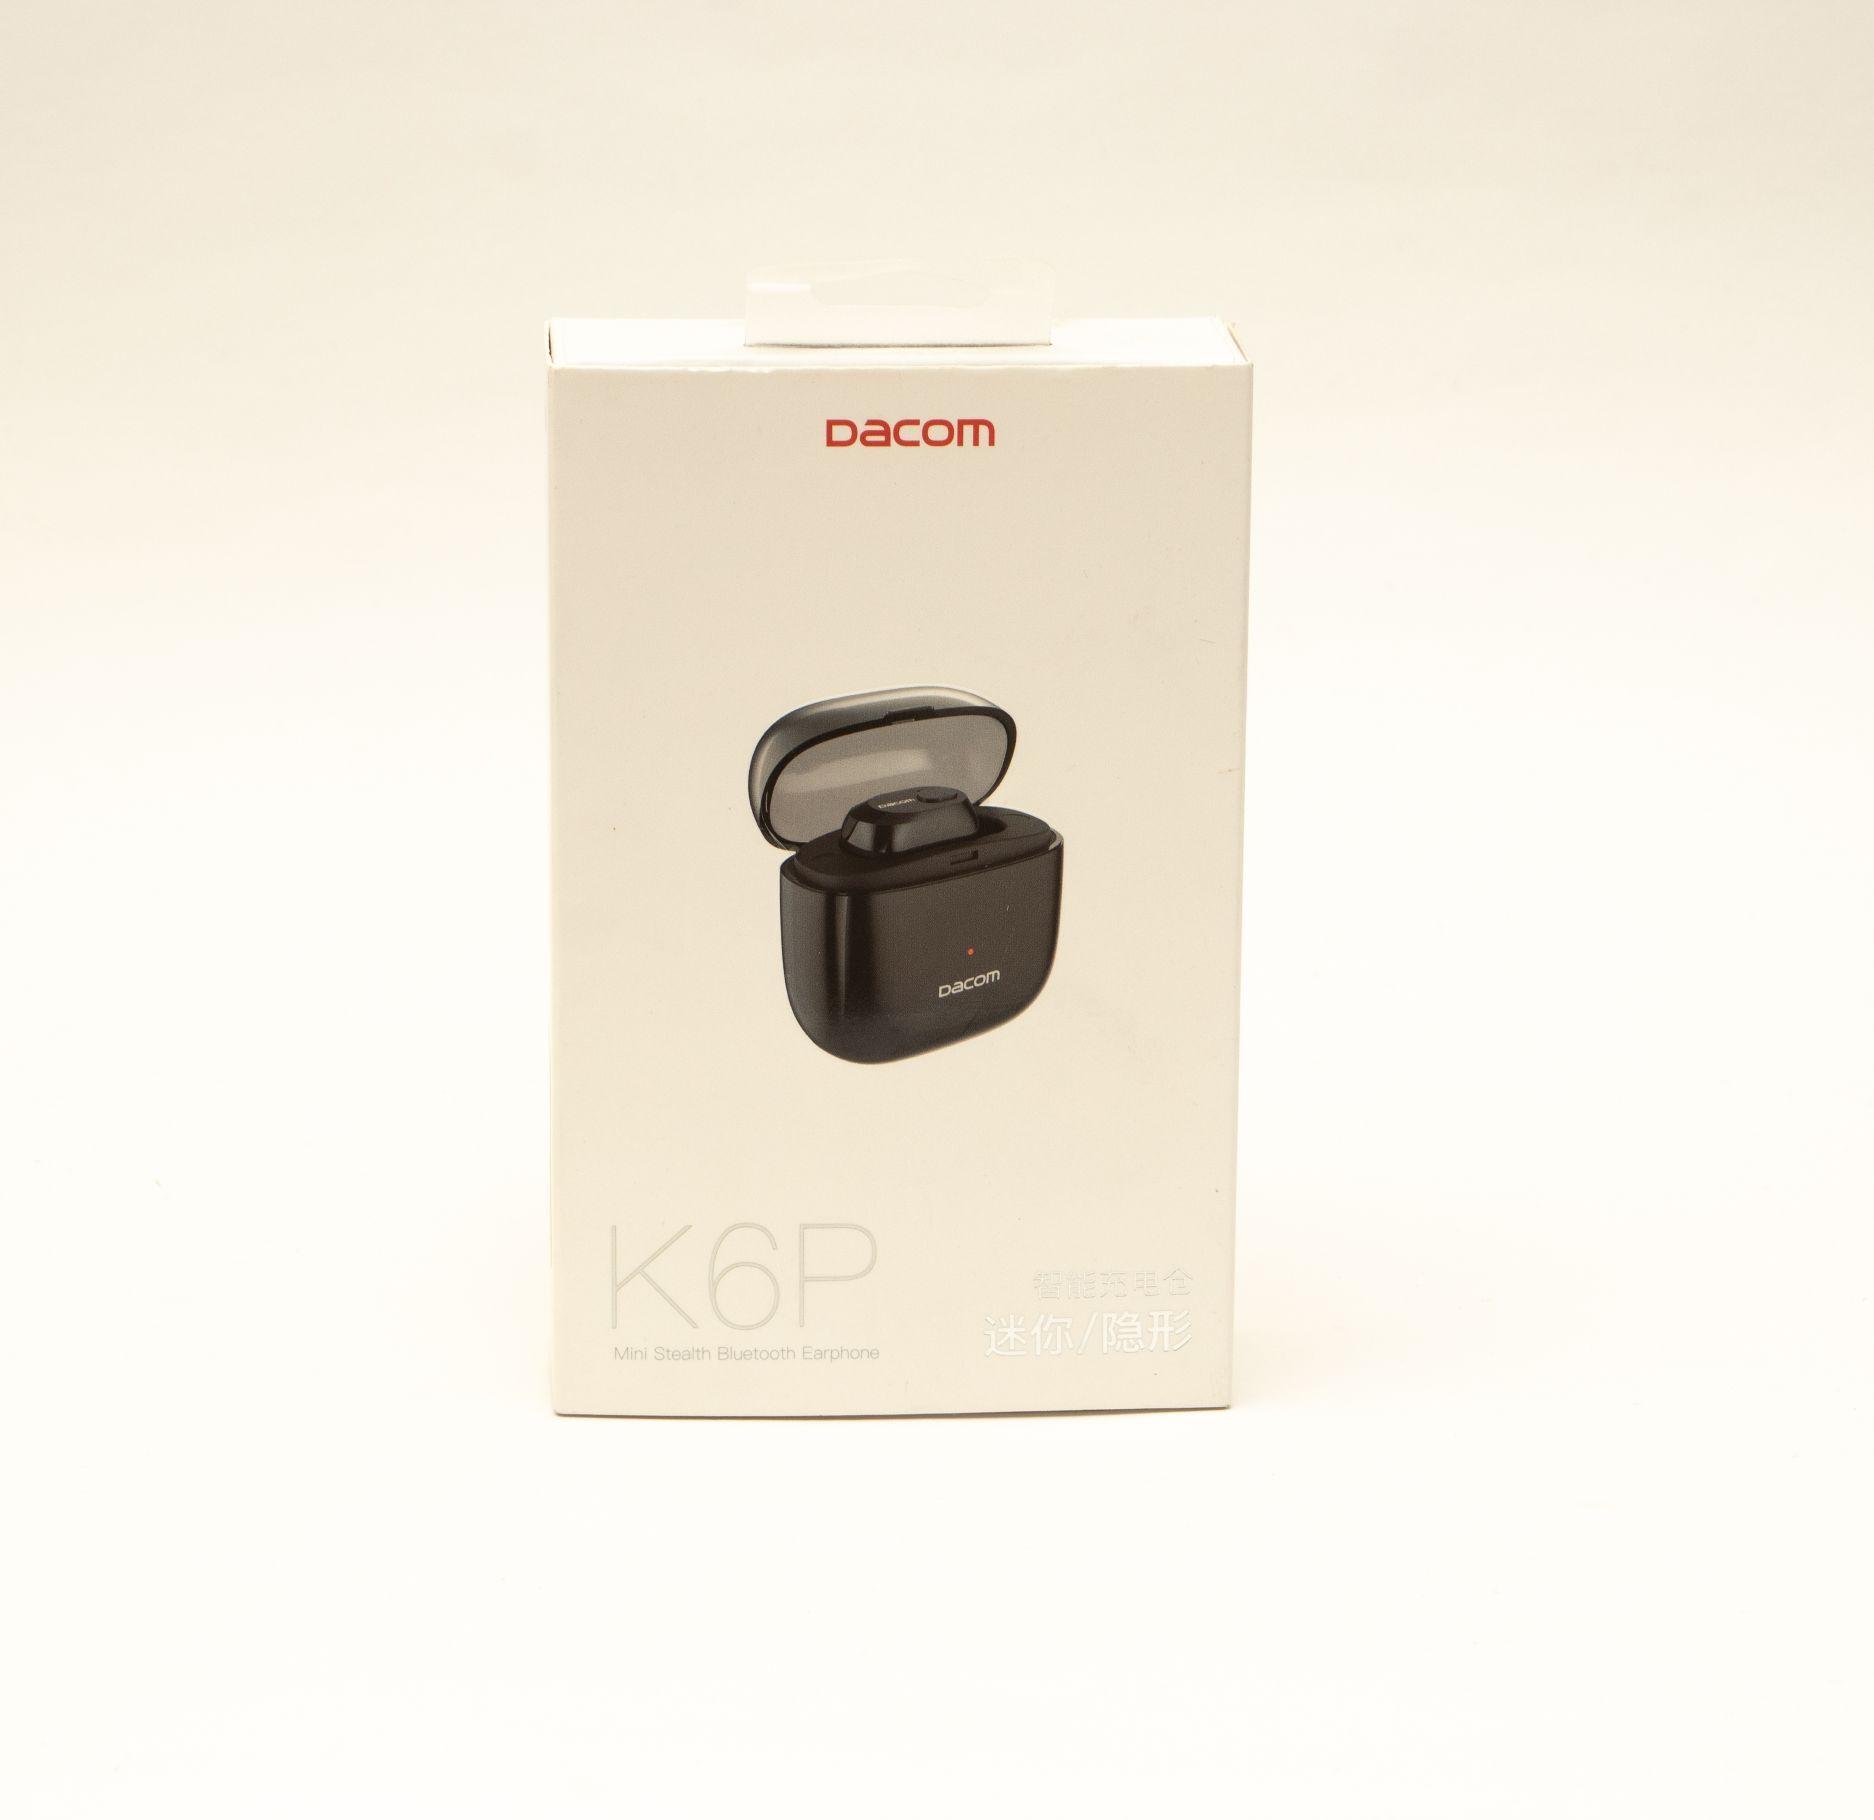 Earbuds Dacom K6p One Ear Black بسعر 520ج بدل من 675ج Phone Accessories Phone Phone Ring